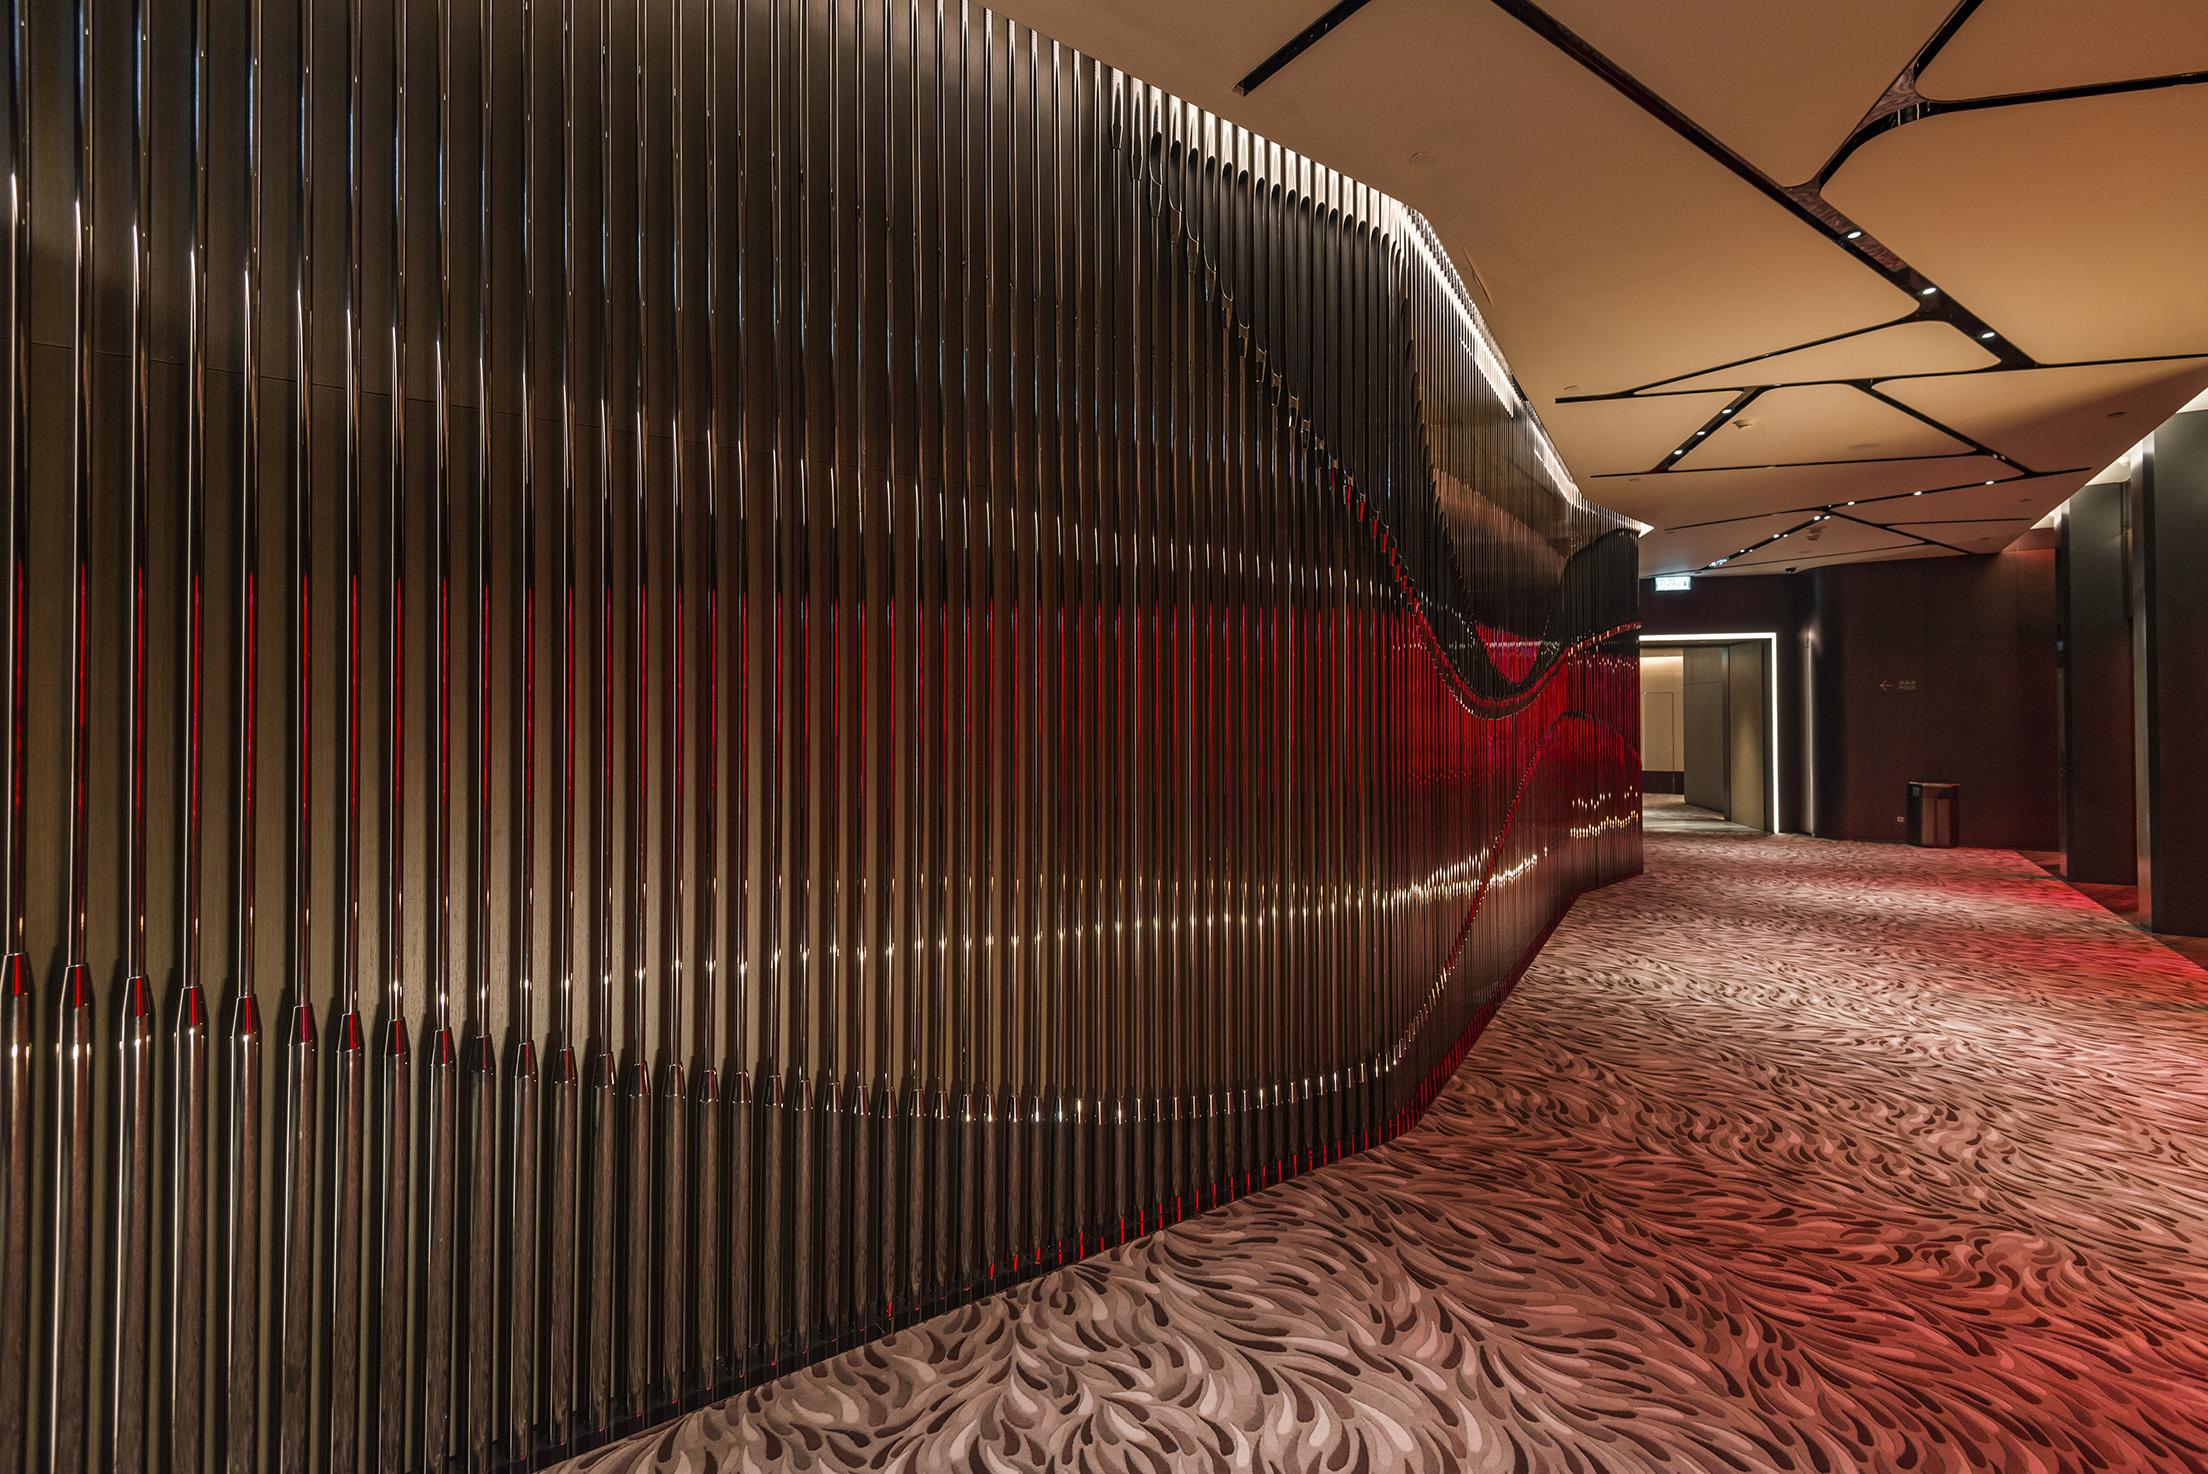 jeb-customprojects-metal-screen-morpheus-hotel-macau-01.jpg